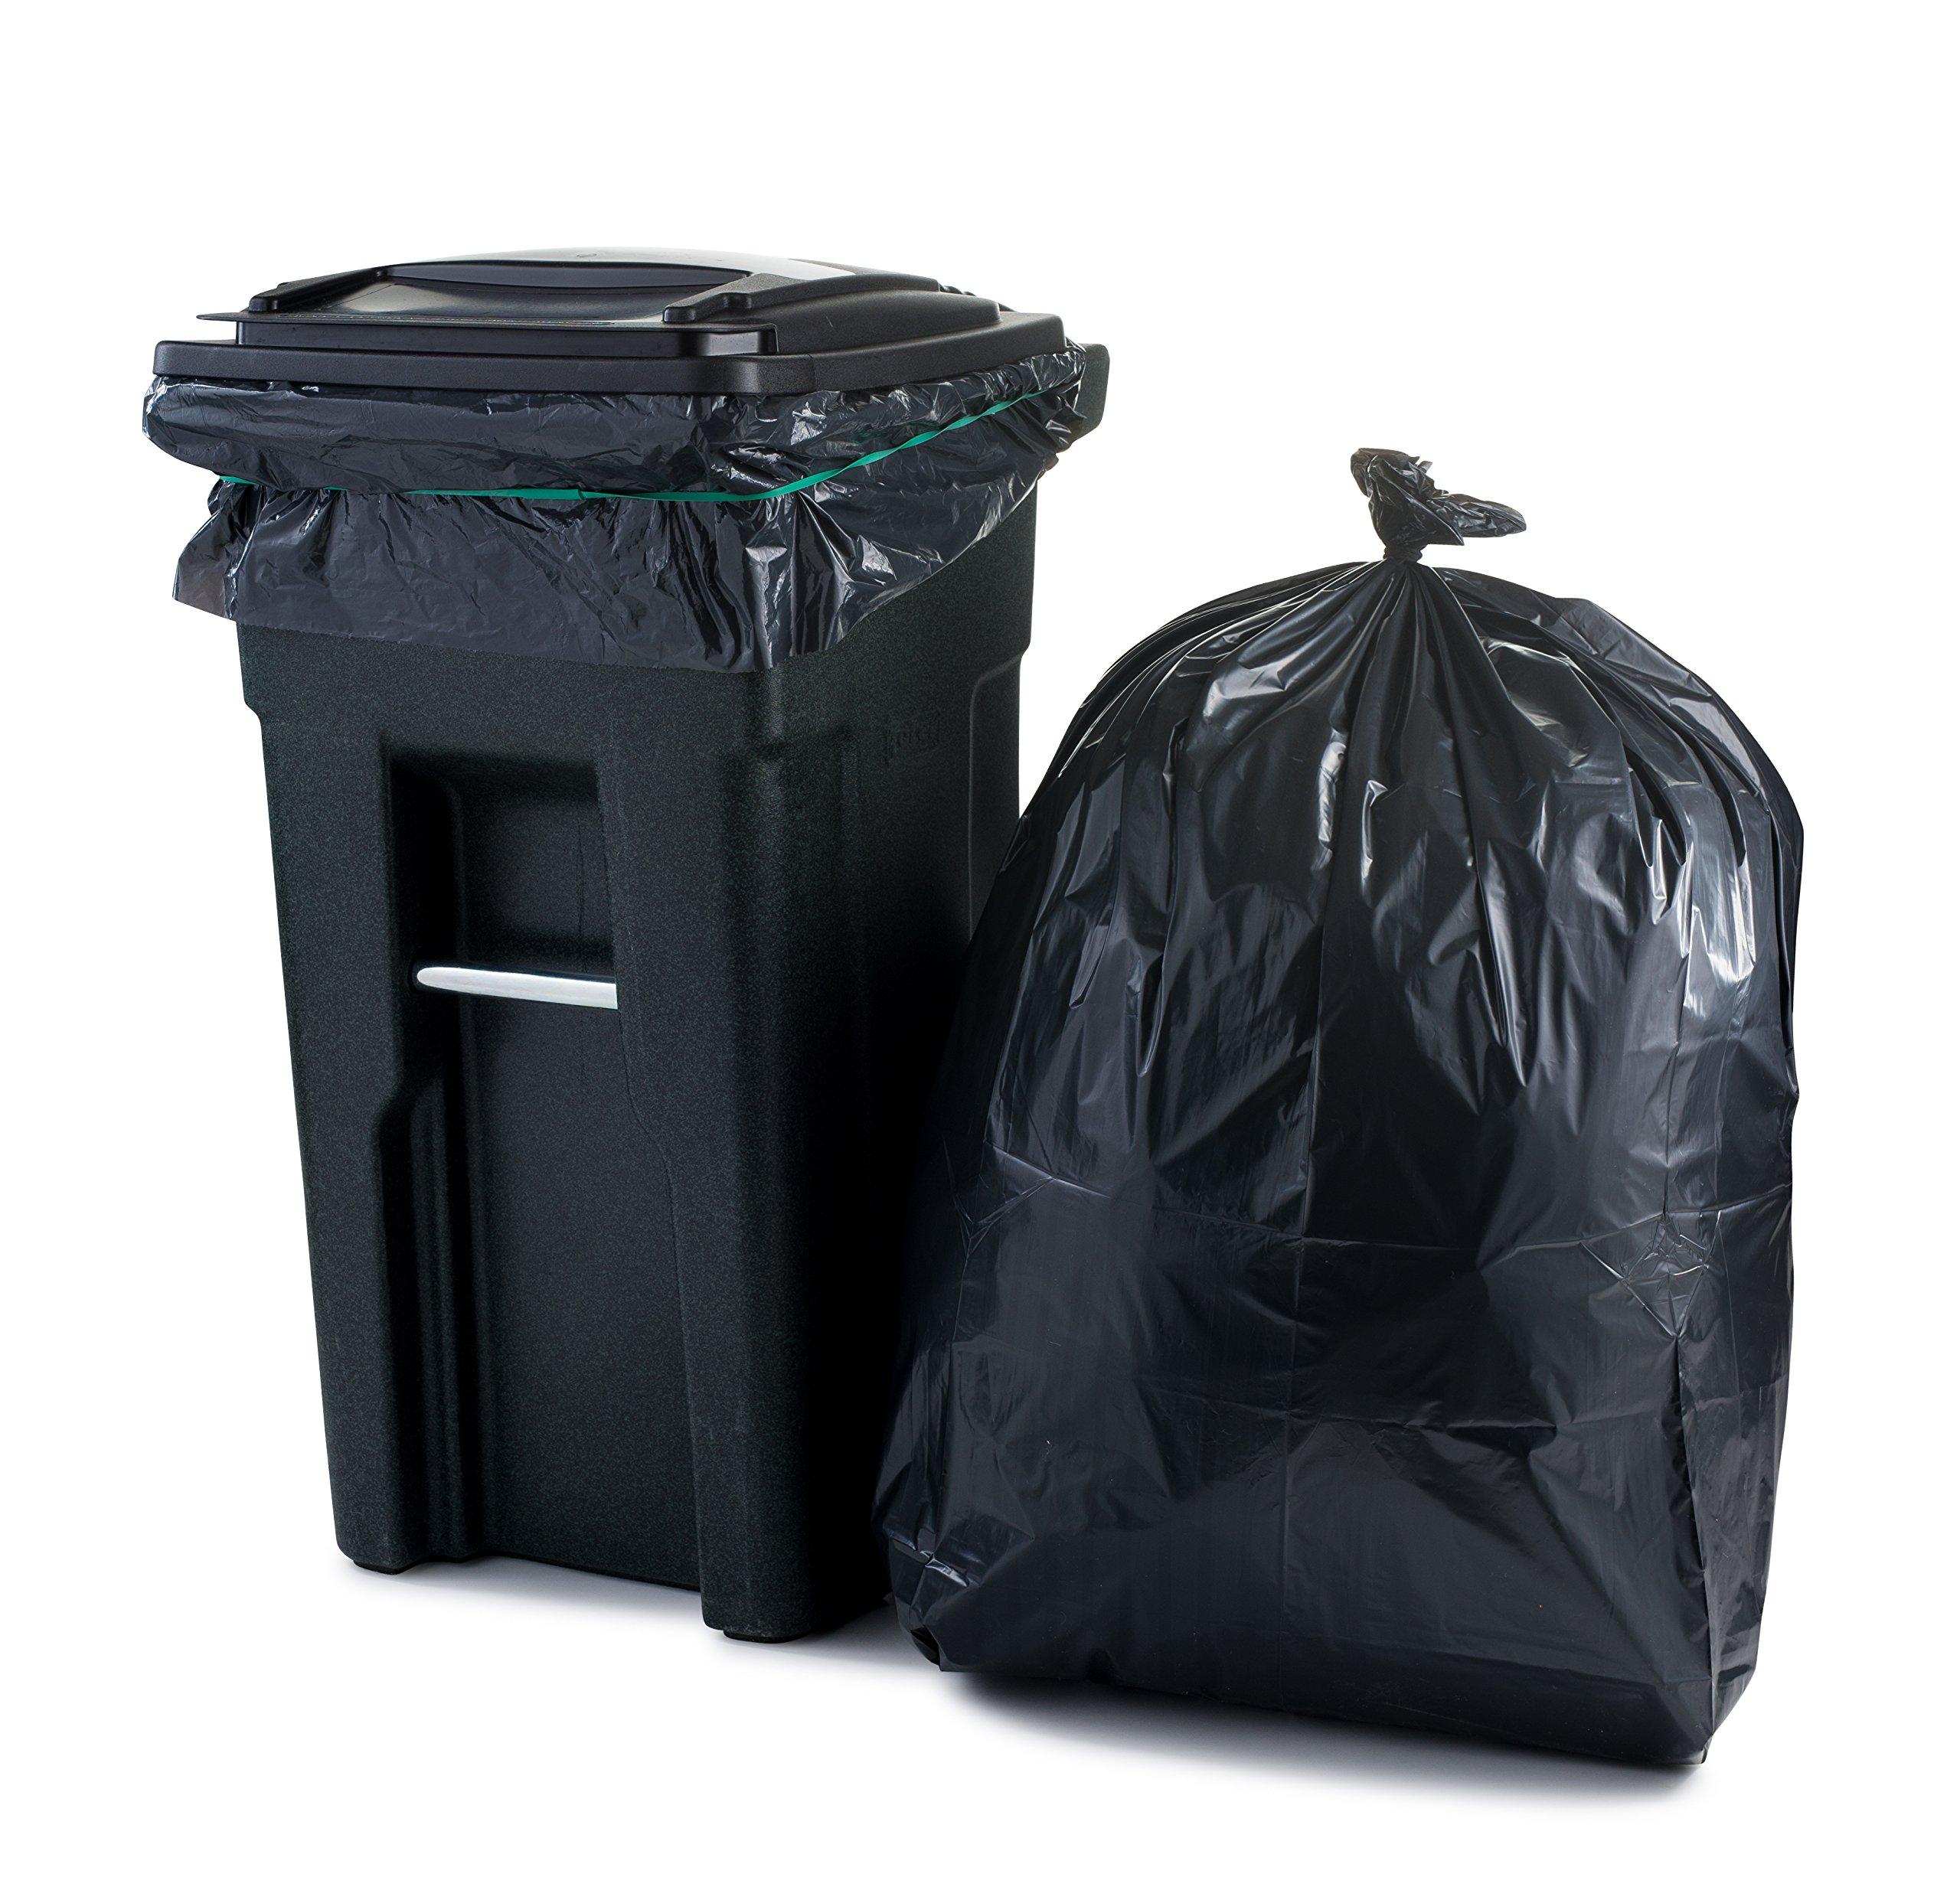 Plasticplace 65 Gallon Extra Heavy Trash Bags , 2.7 Mil, 50''W x 48''H, Black, 25/case